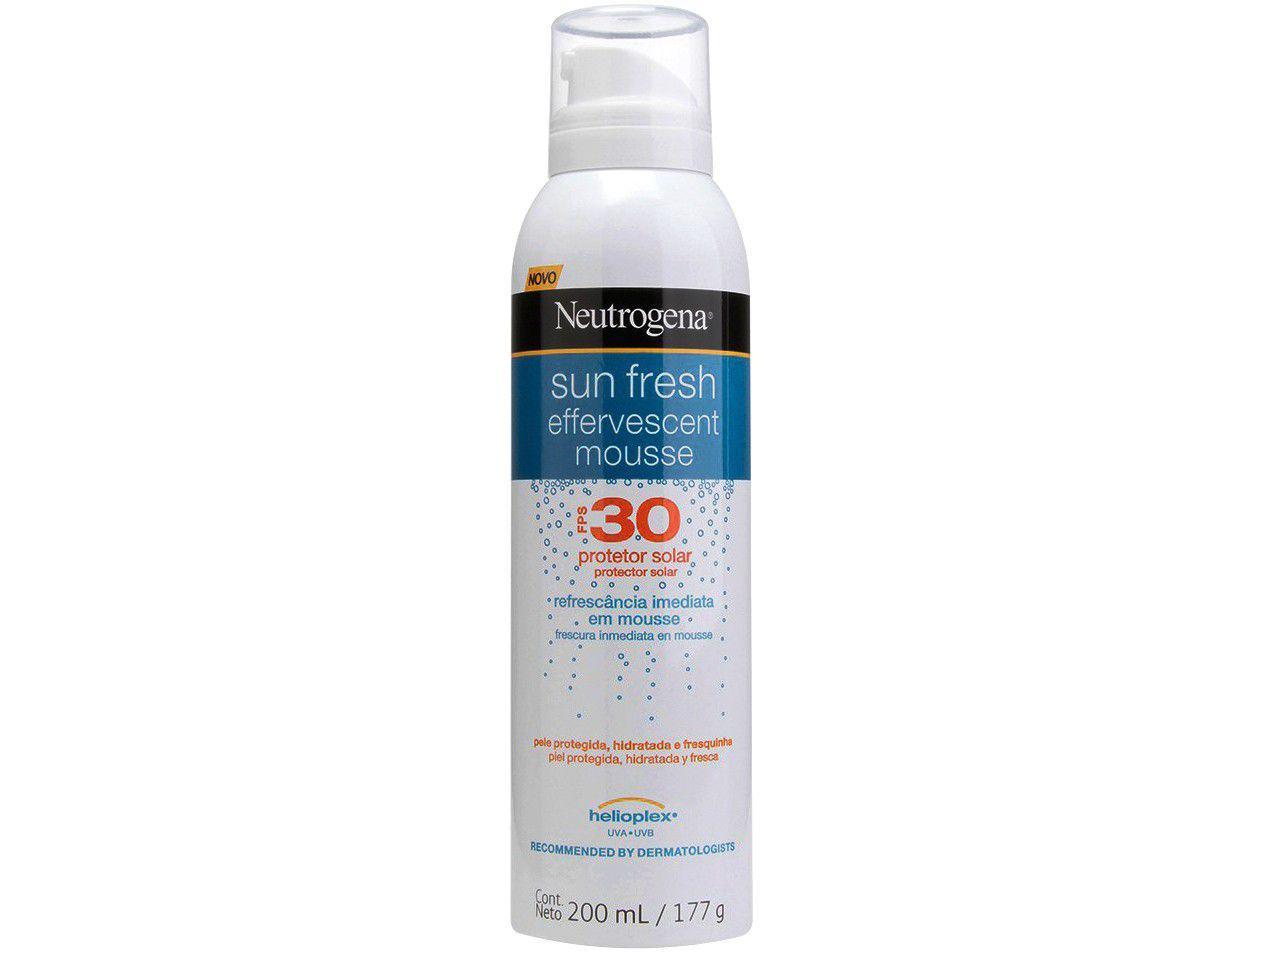 Protetor Solar Neutrogena Sun Fresh Mousse - Efervescente FPS 30 200ml